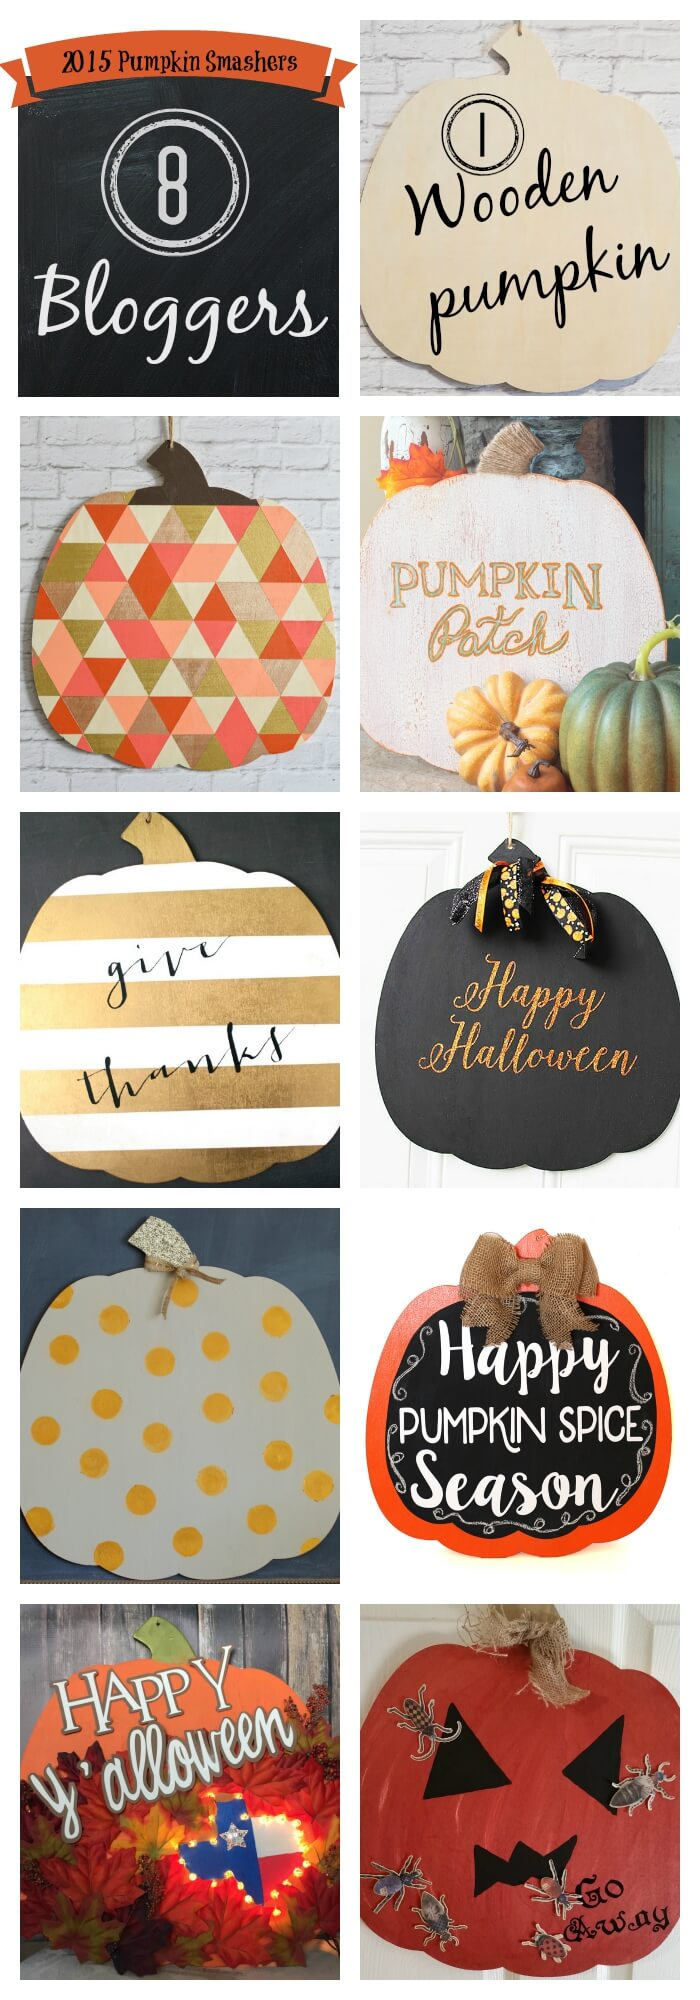 2015 Pumpkin Smashers